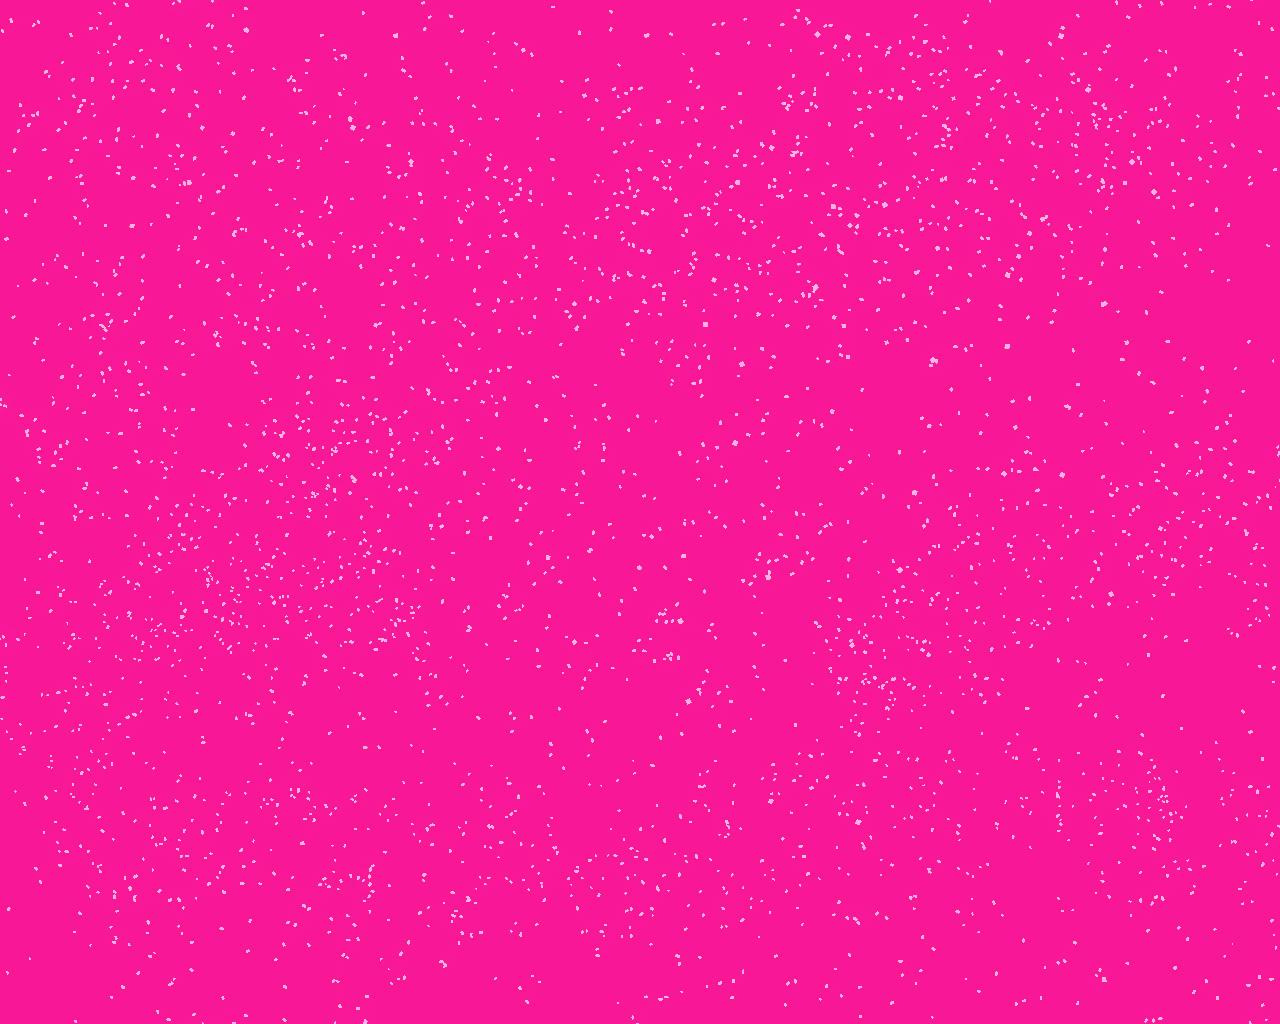 Wallpaper A Pink | Free Download Wallpaper | DaWallpaperz